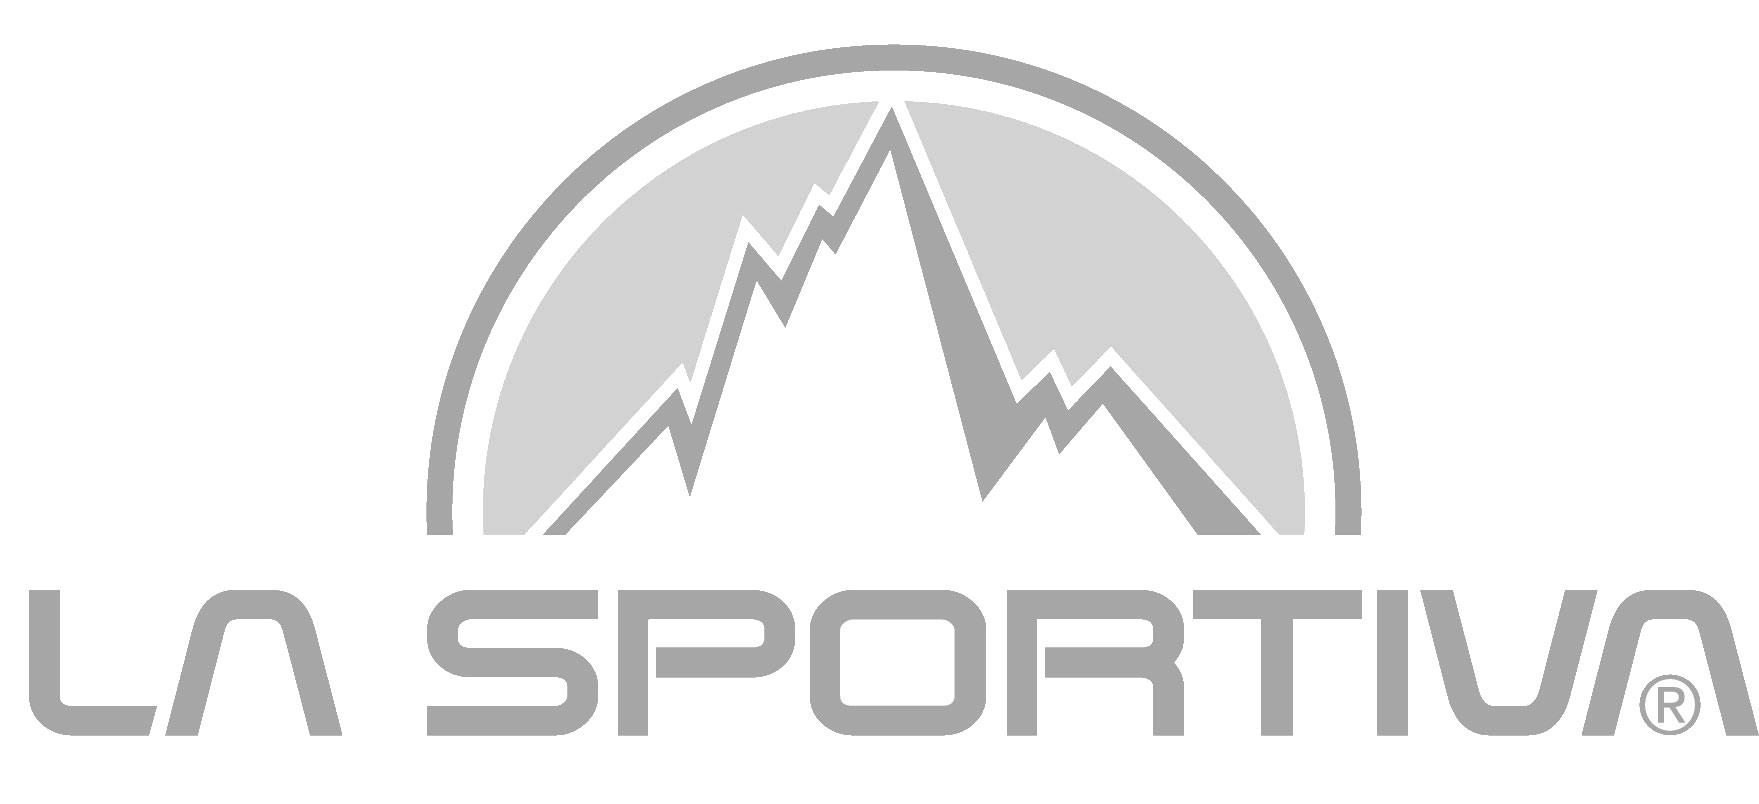 grey-SportivaLogo_Innovation_Lg.jpg